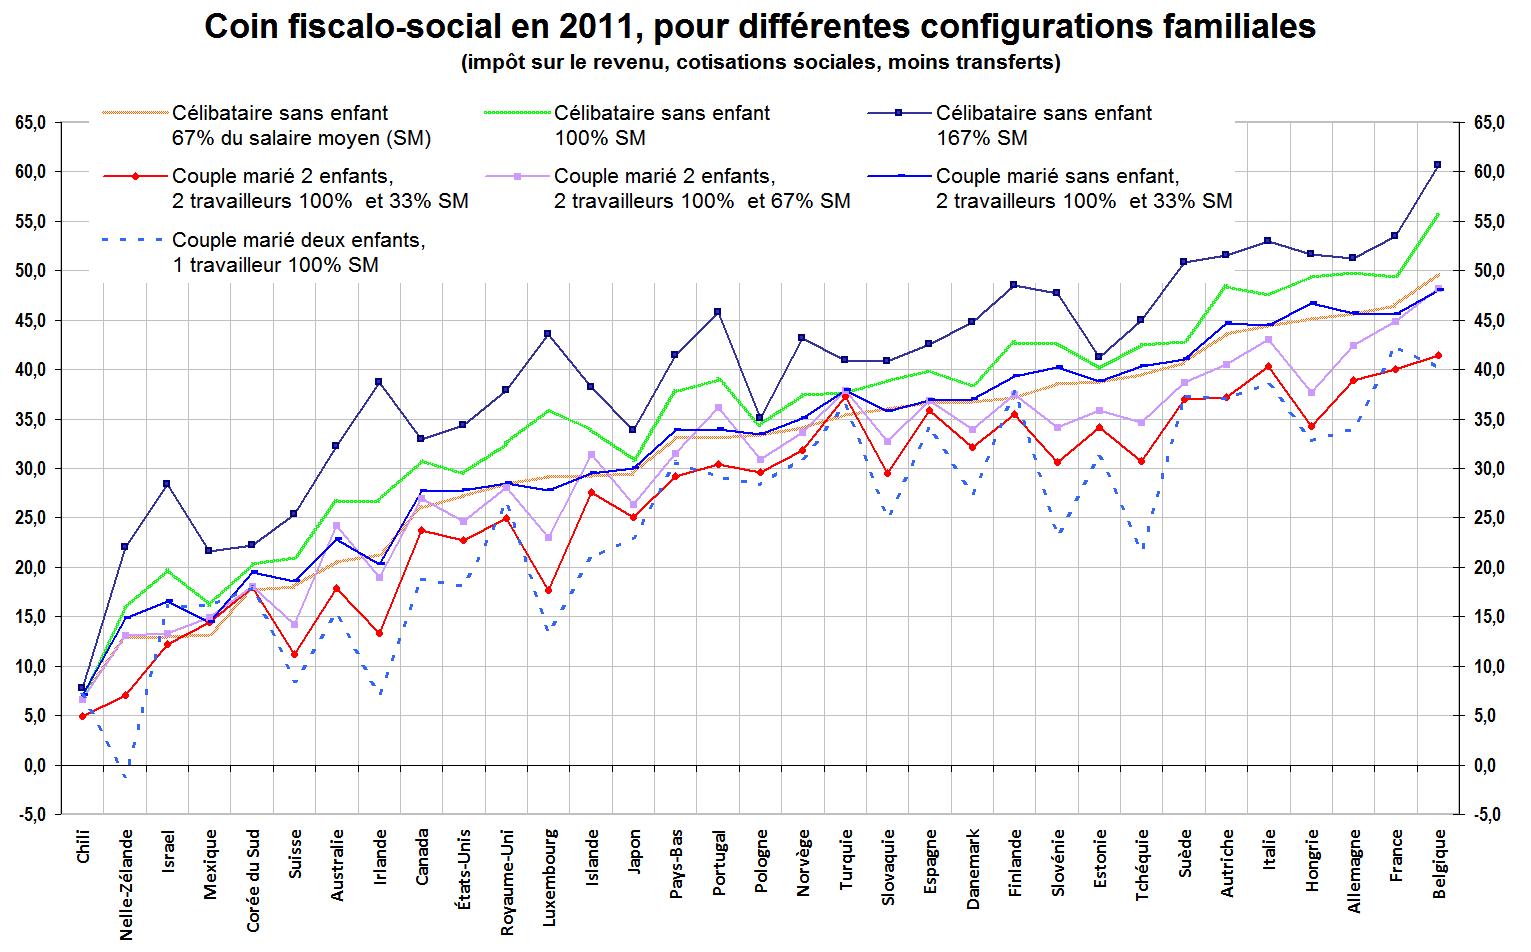 Coin_fiscalo-social_2011.png